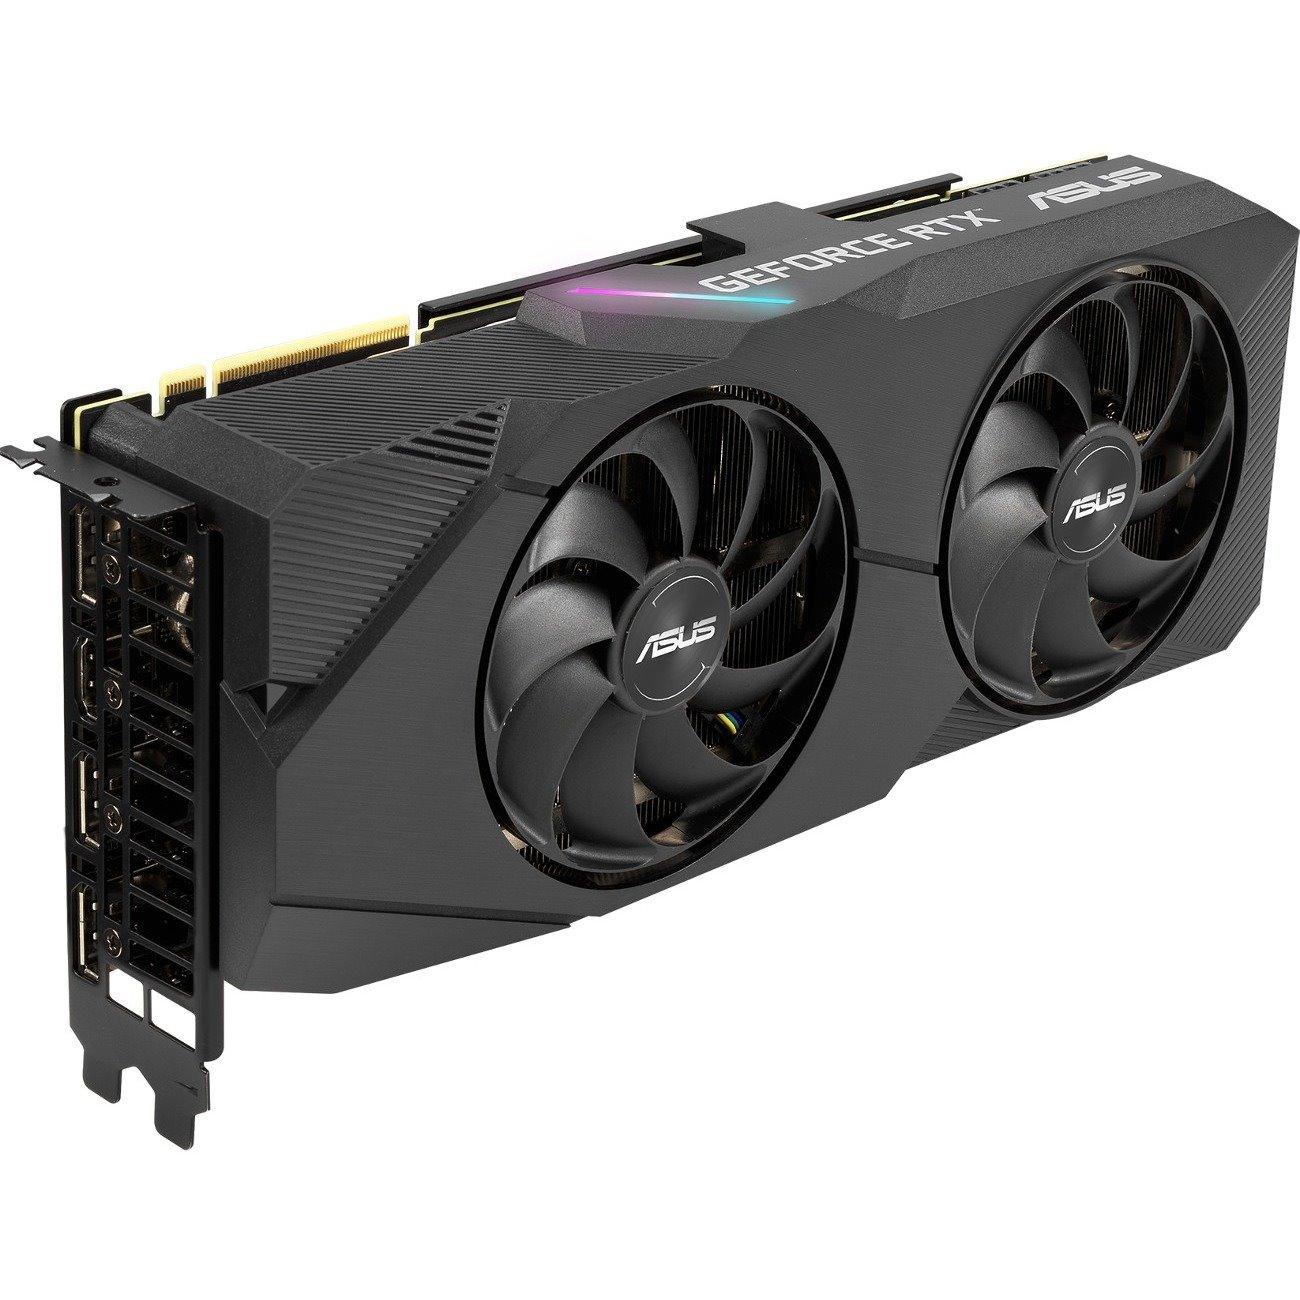 Asus Dual DUAL-RTX2070S-8G-EVO GeForce RTX 2070 SUPER Graphic Card - 8 GB GDDR6